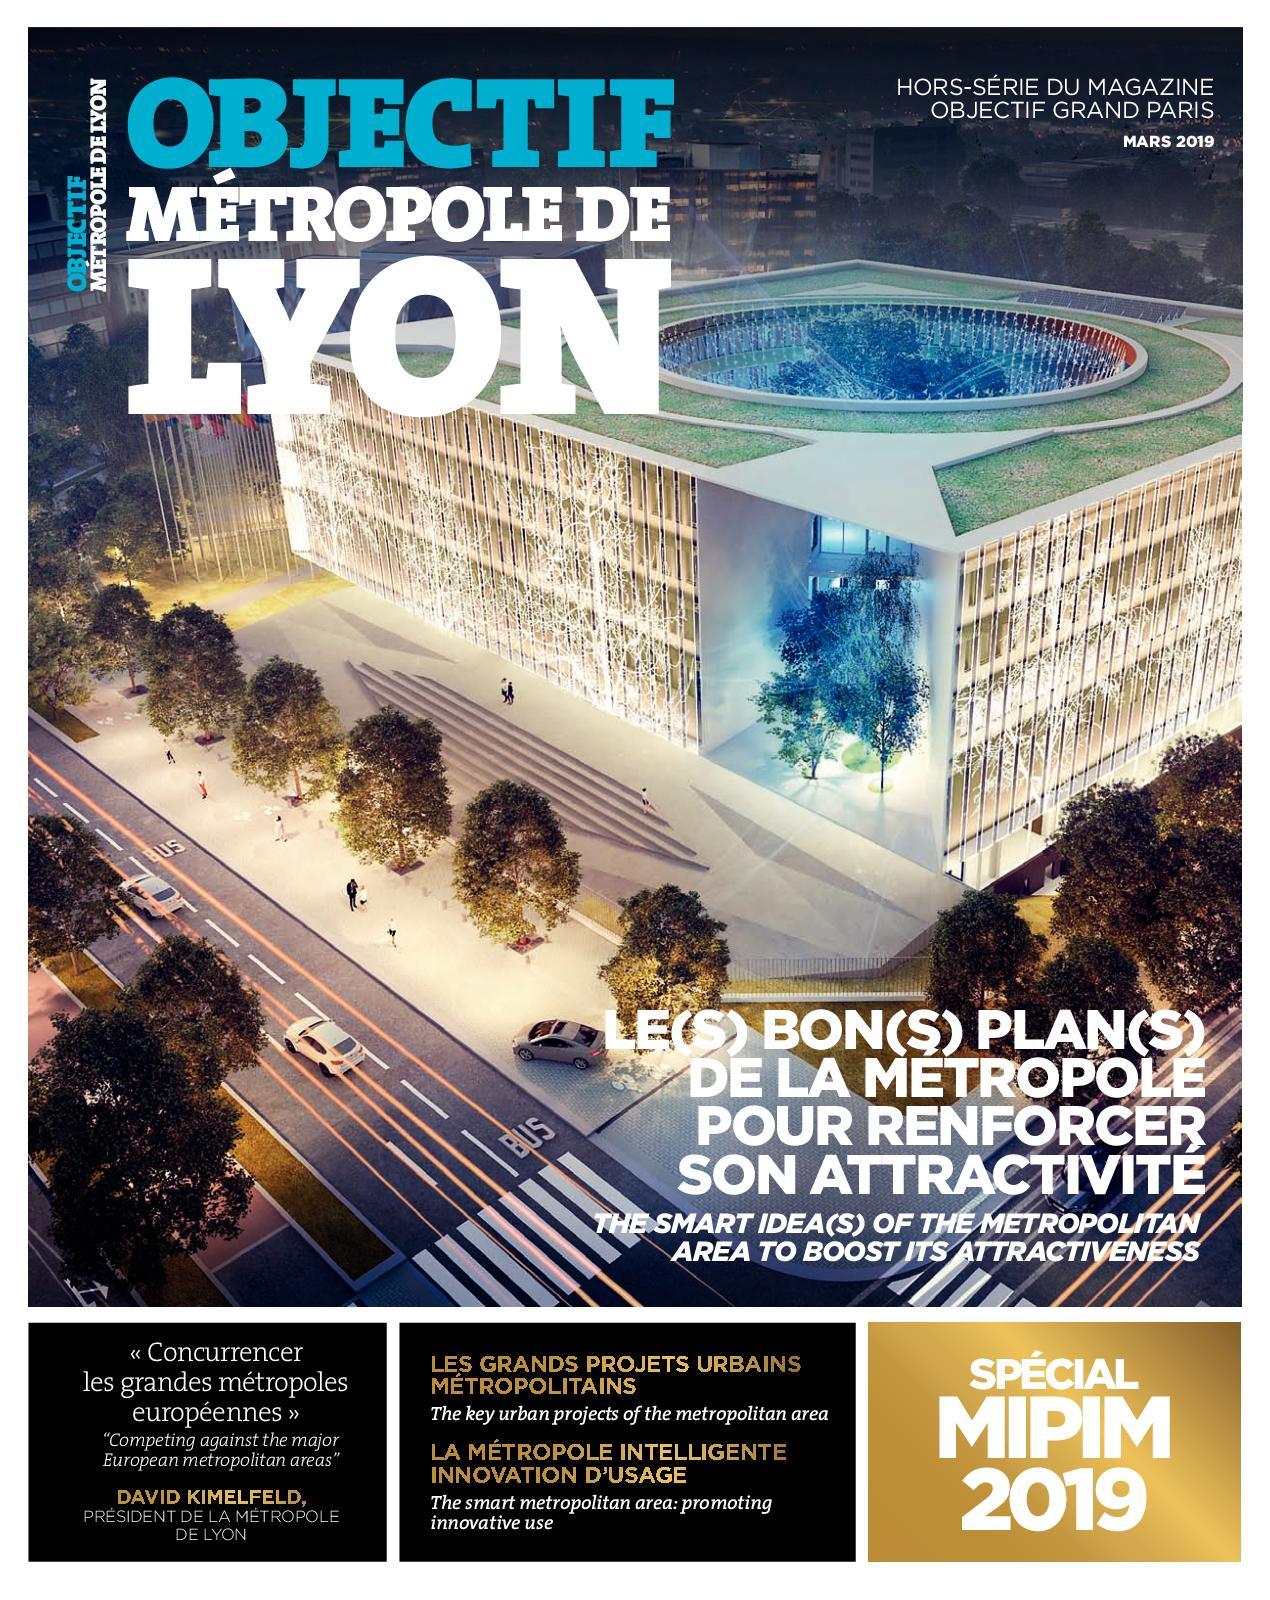 OBJECTIF METROPOLE DE LYON 2019